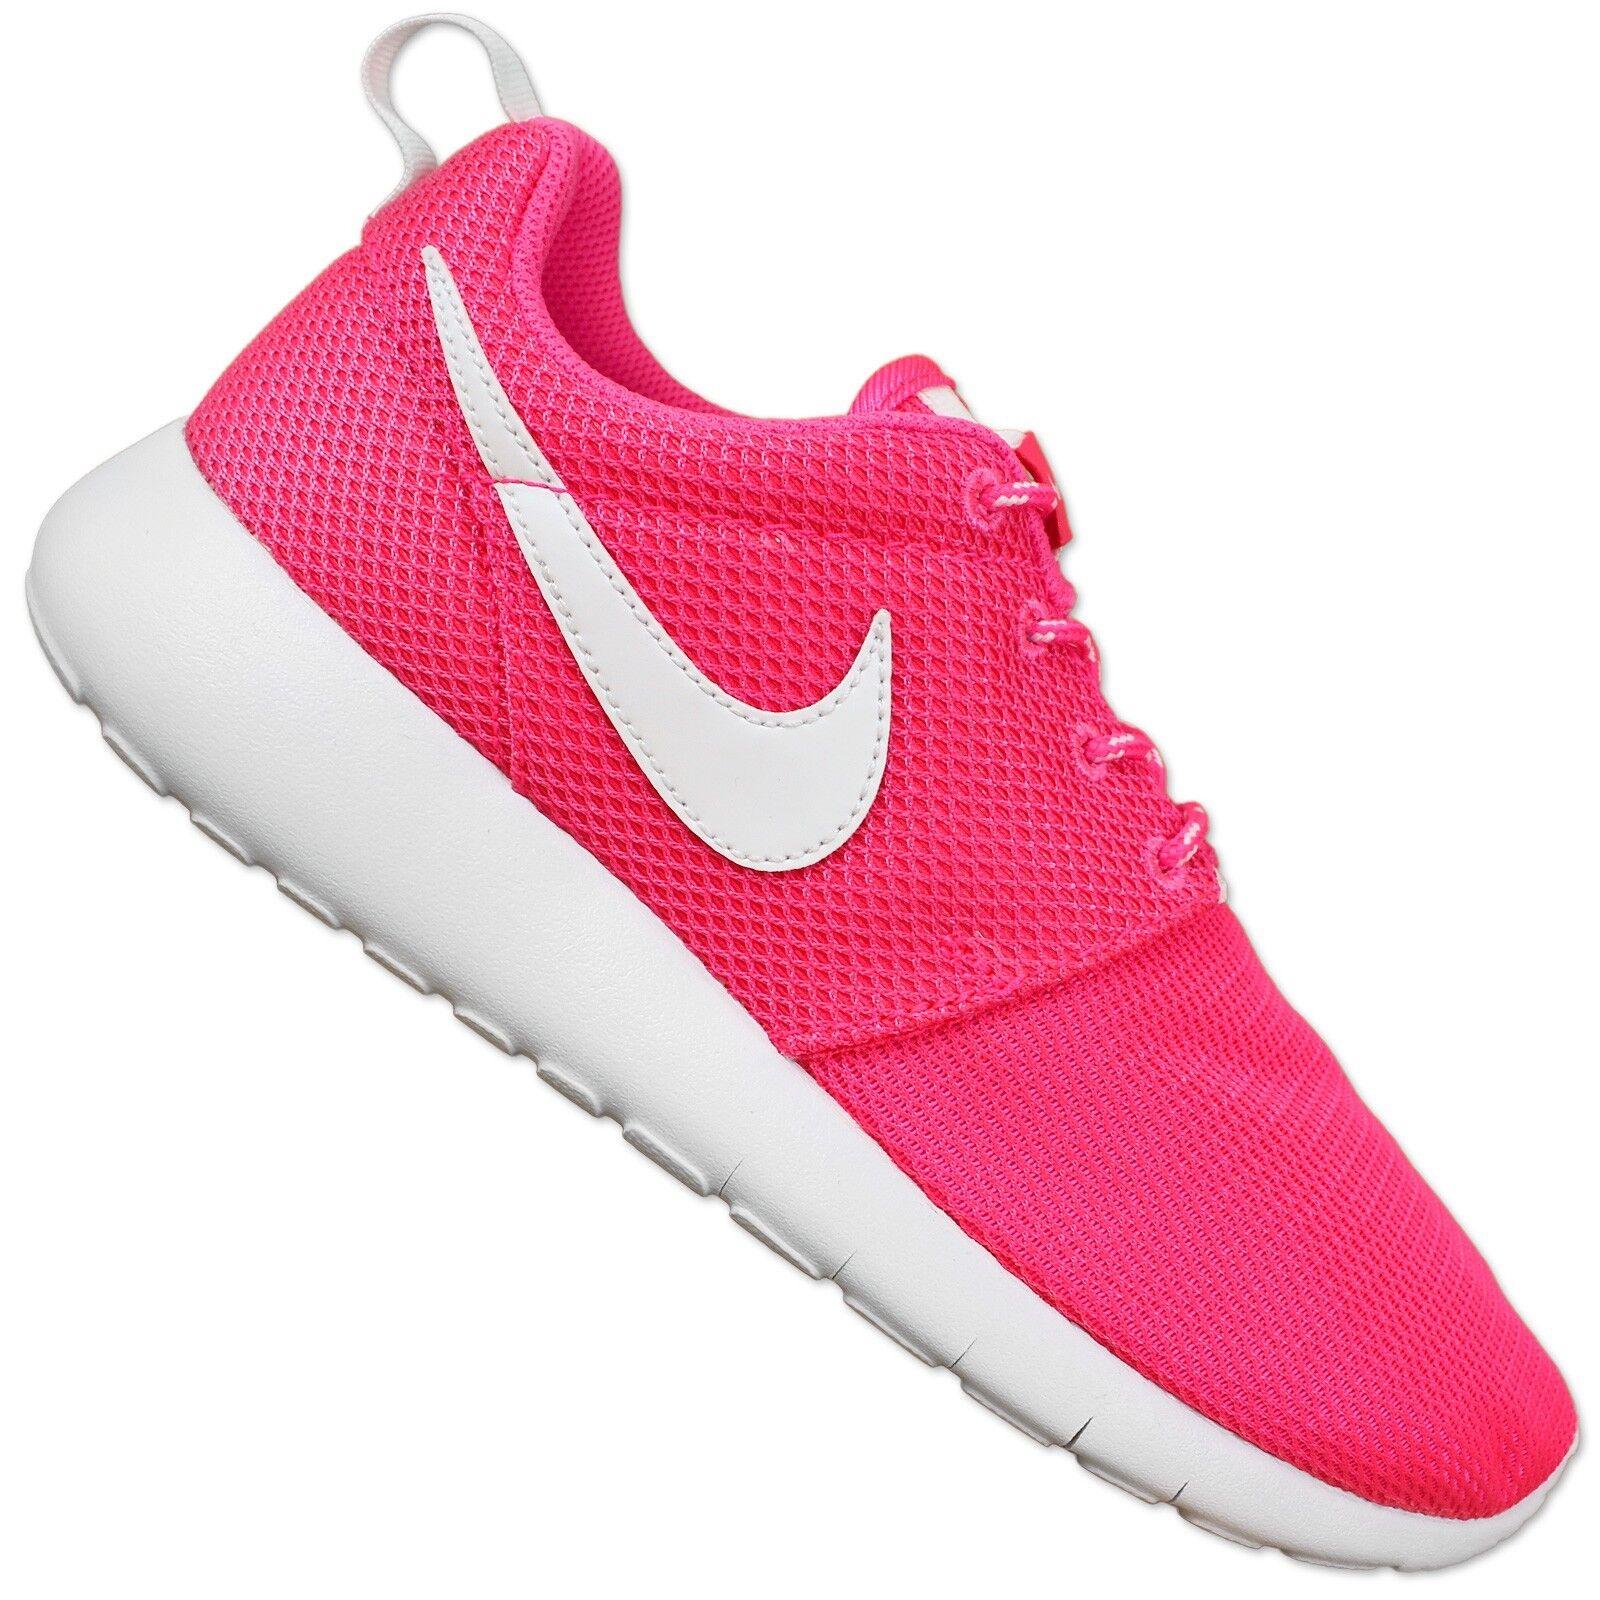 Nike roshe one mentecato Lunarlon jogging ocio zapatillas running zapatos rosa 36